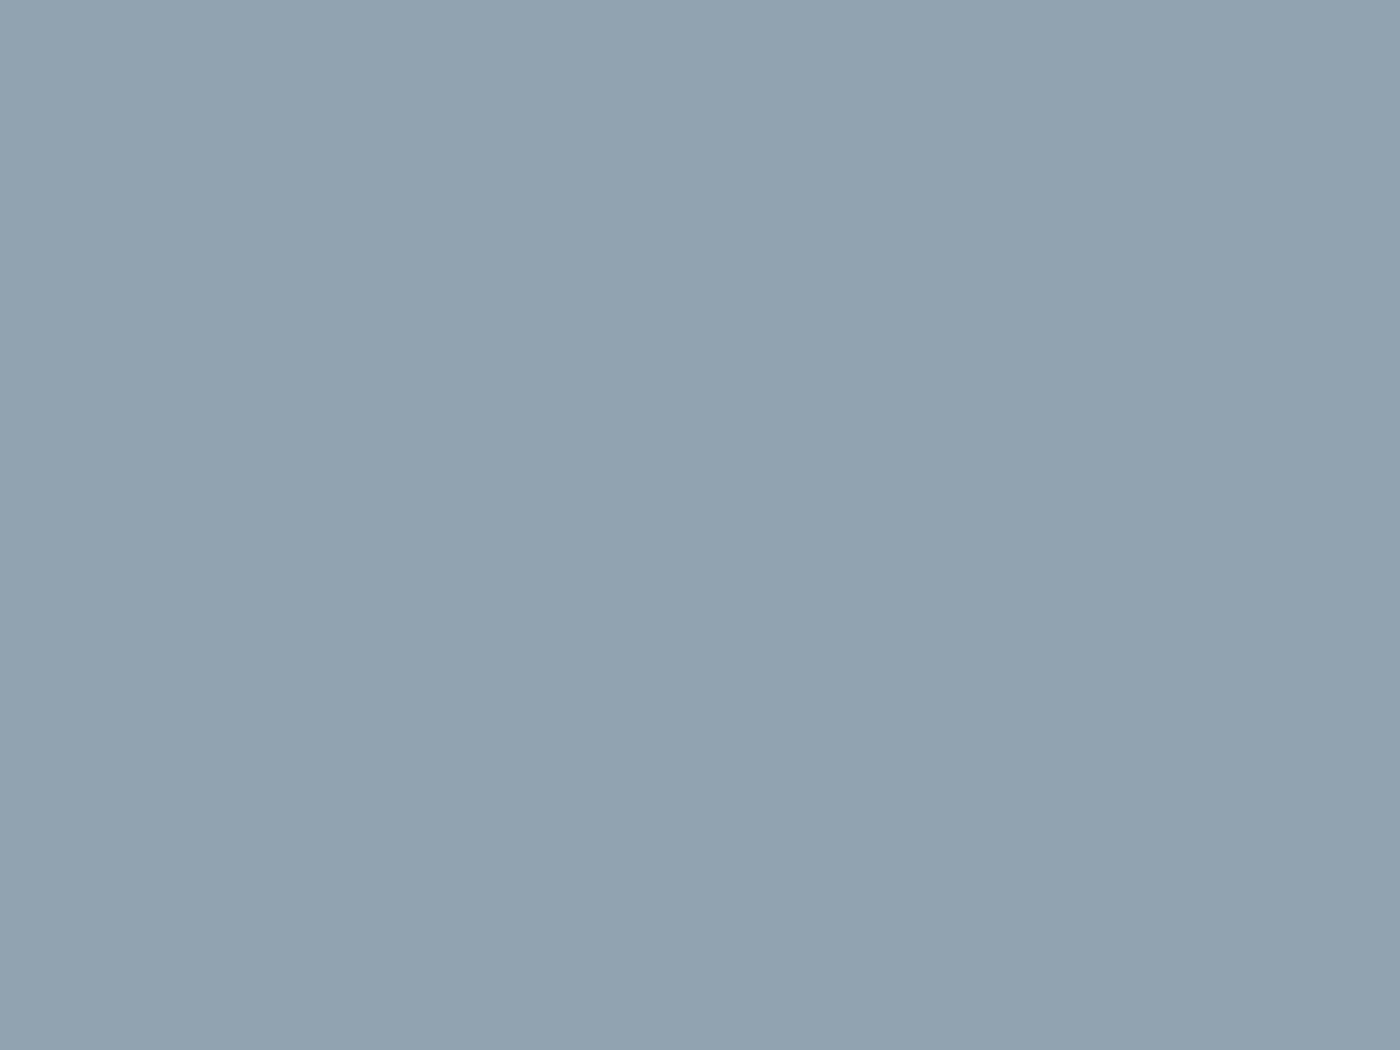 1400x1050 Cadet Grey Solid Color Background